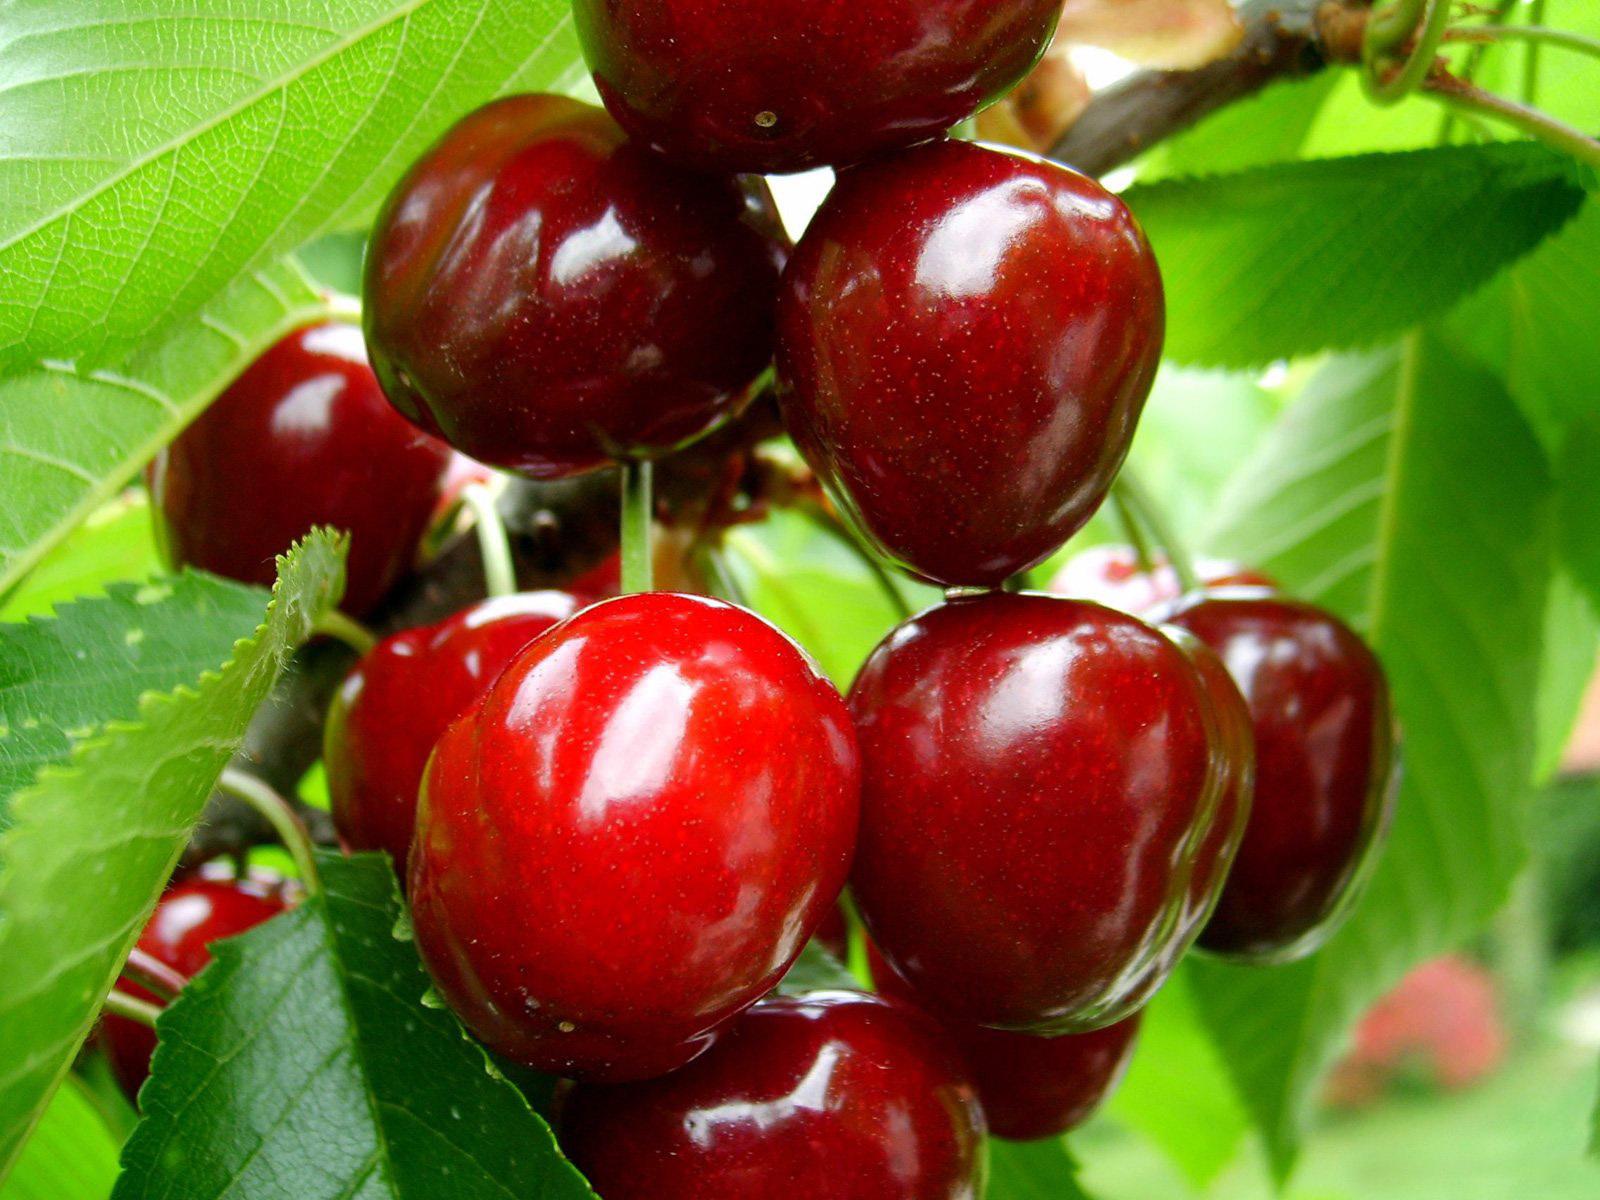 Handy-Wallpaper Obst, Kirsche, Lebensmittel, Berries kostenlos herunterladen.